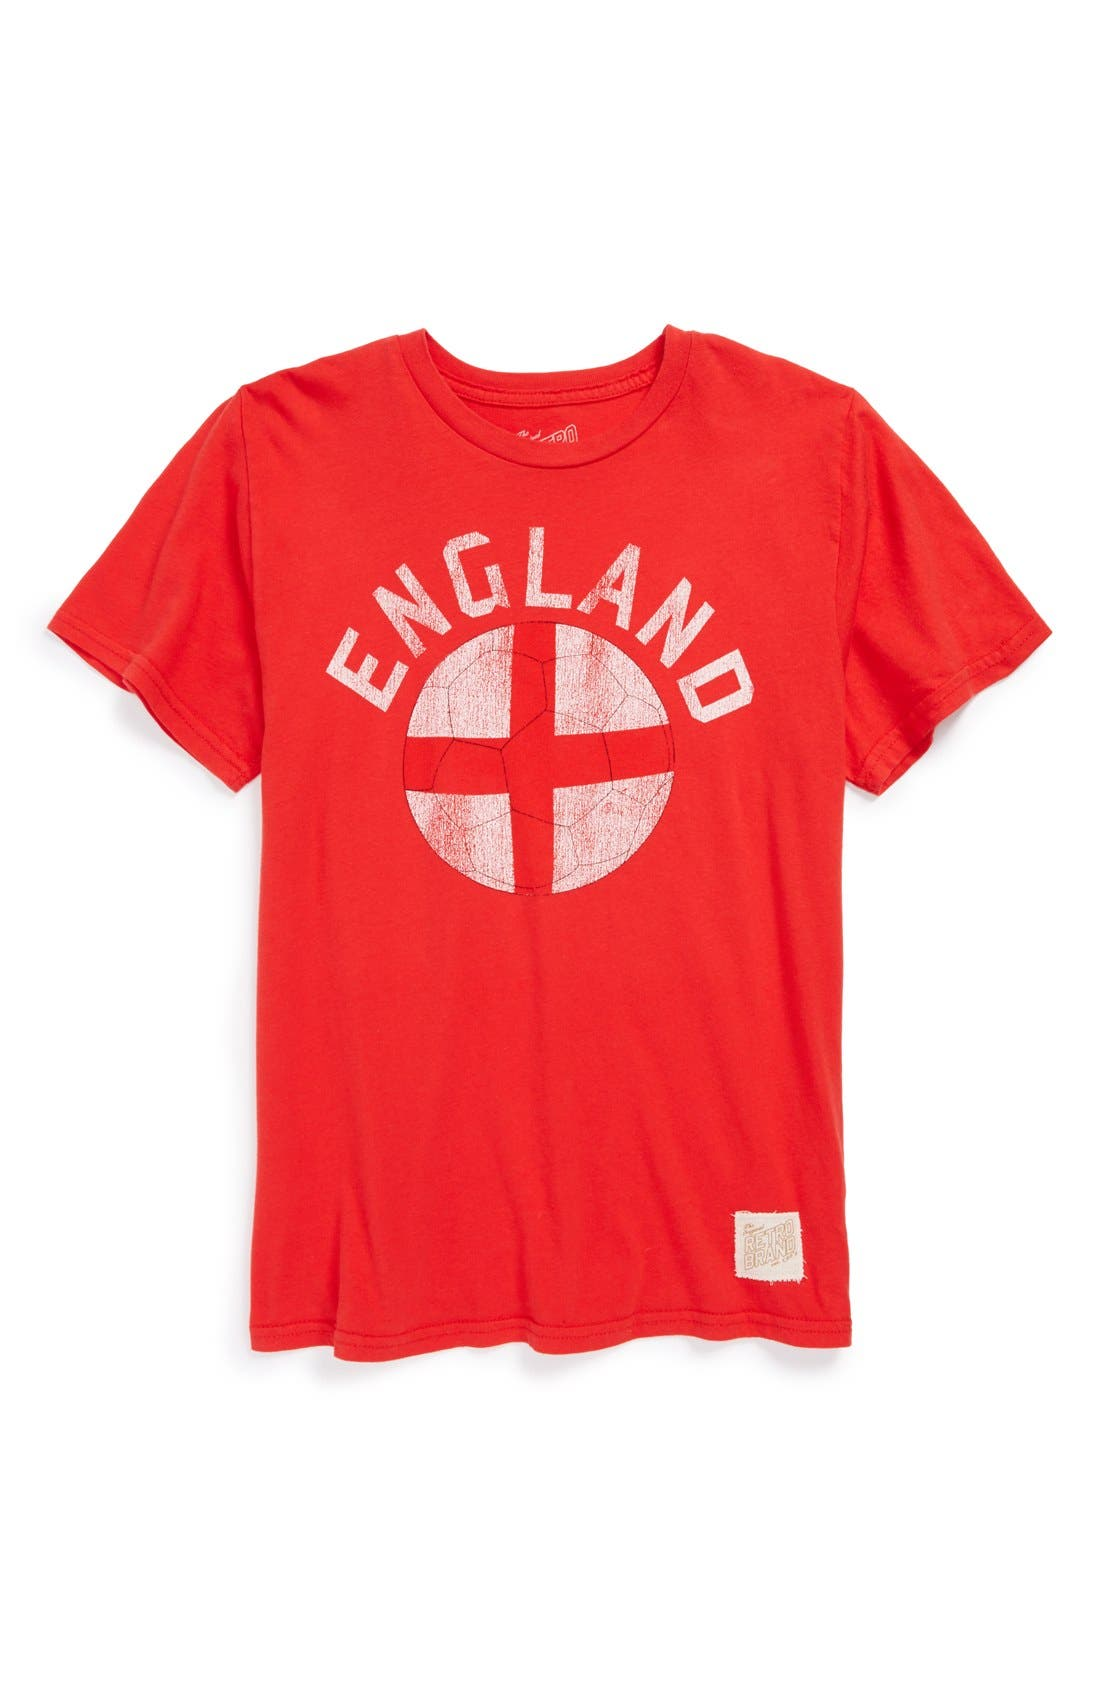 Alternate Image 1 Selected - Retro Brand 'England Soccer' Graphic T-Shirt (Big Boys)